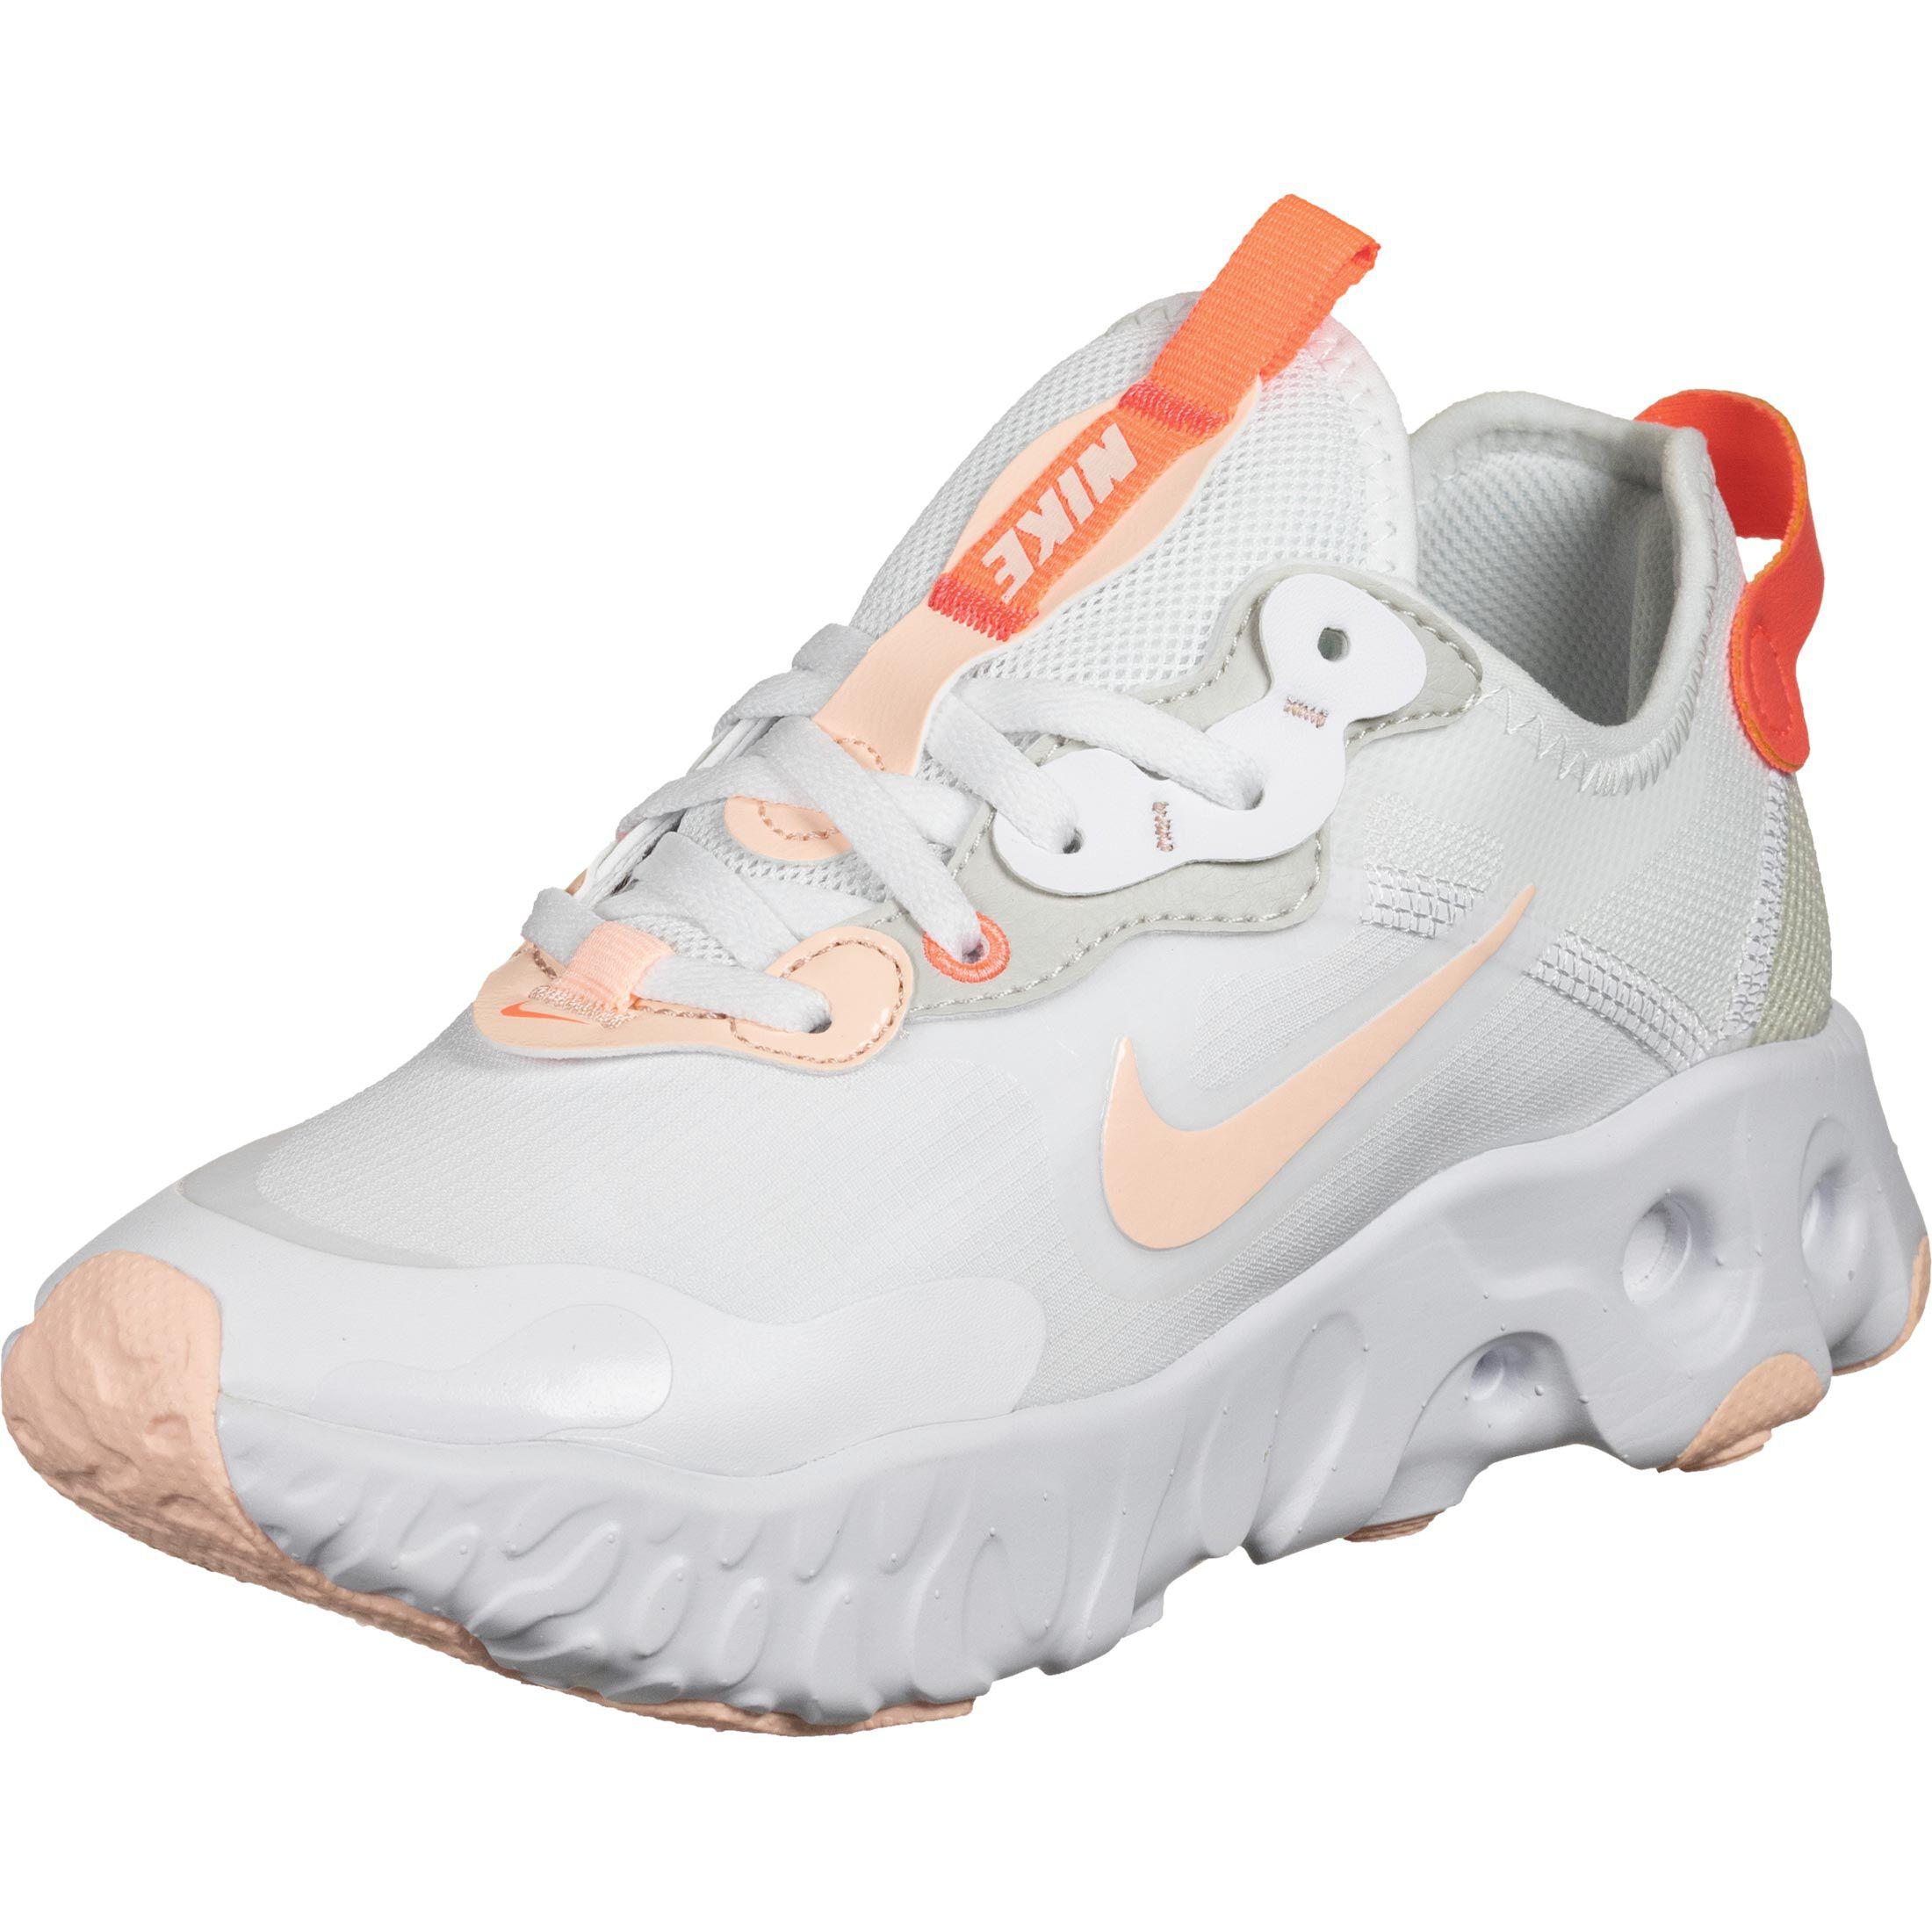 Nike REACT ART3MIS - Sneakers Low at Stylefile